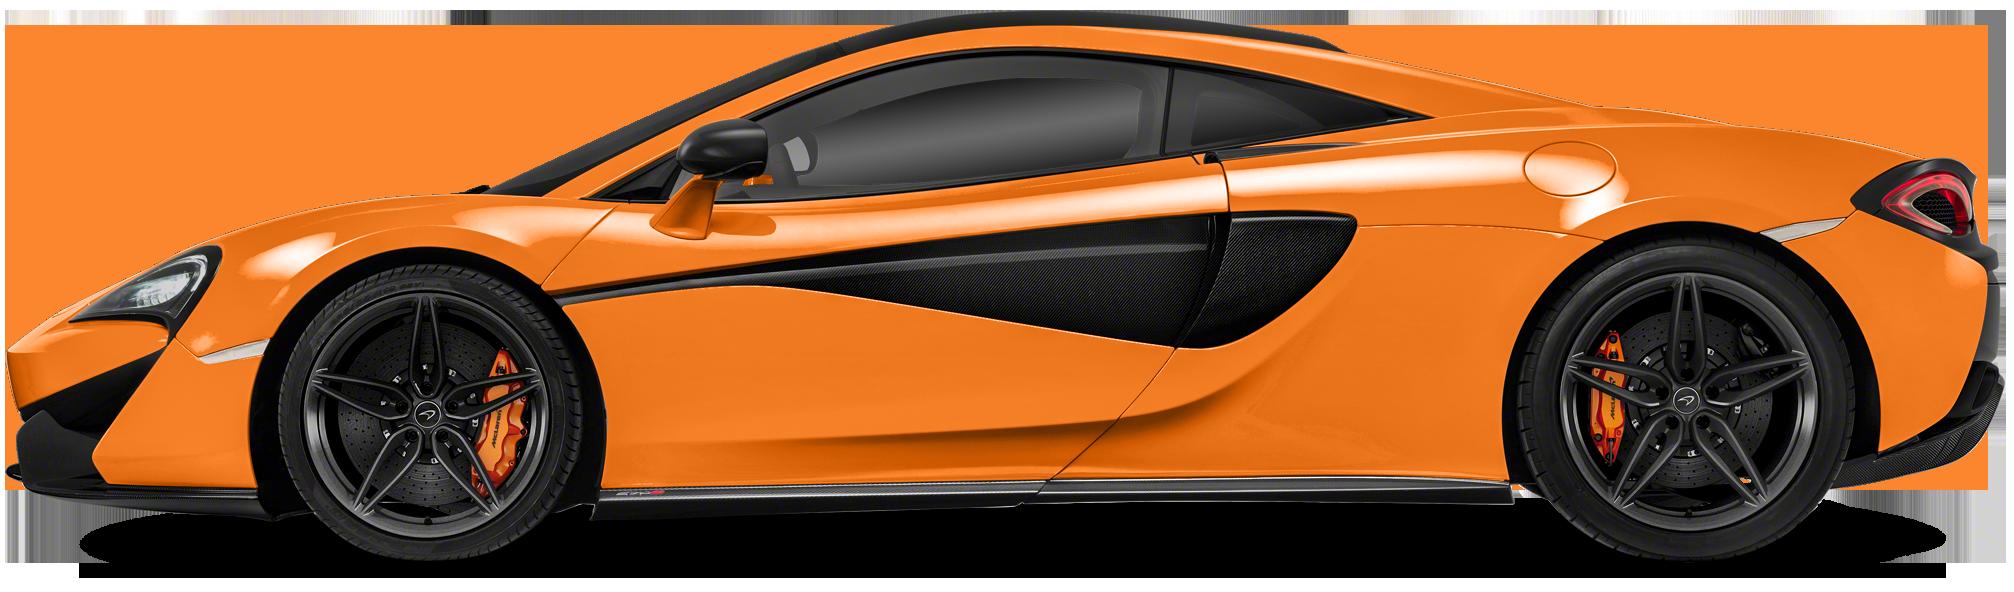 2020 McLaren 570S Coupe